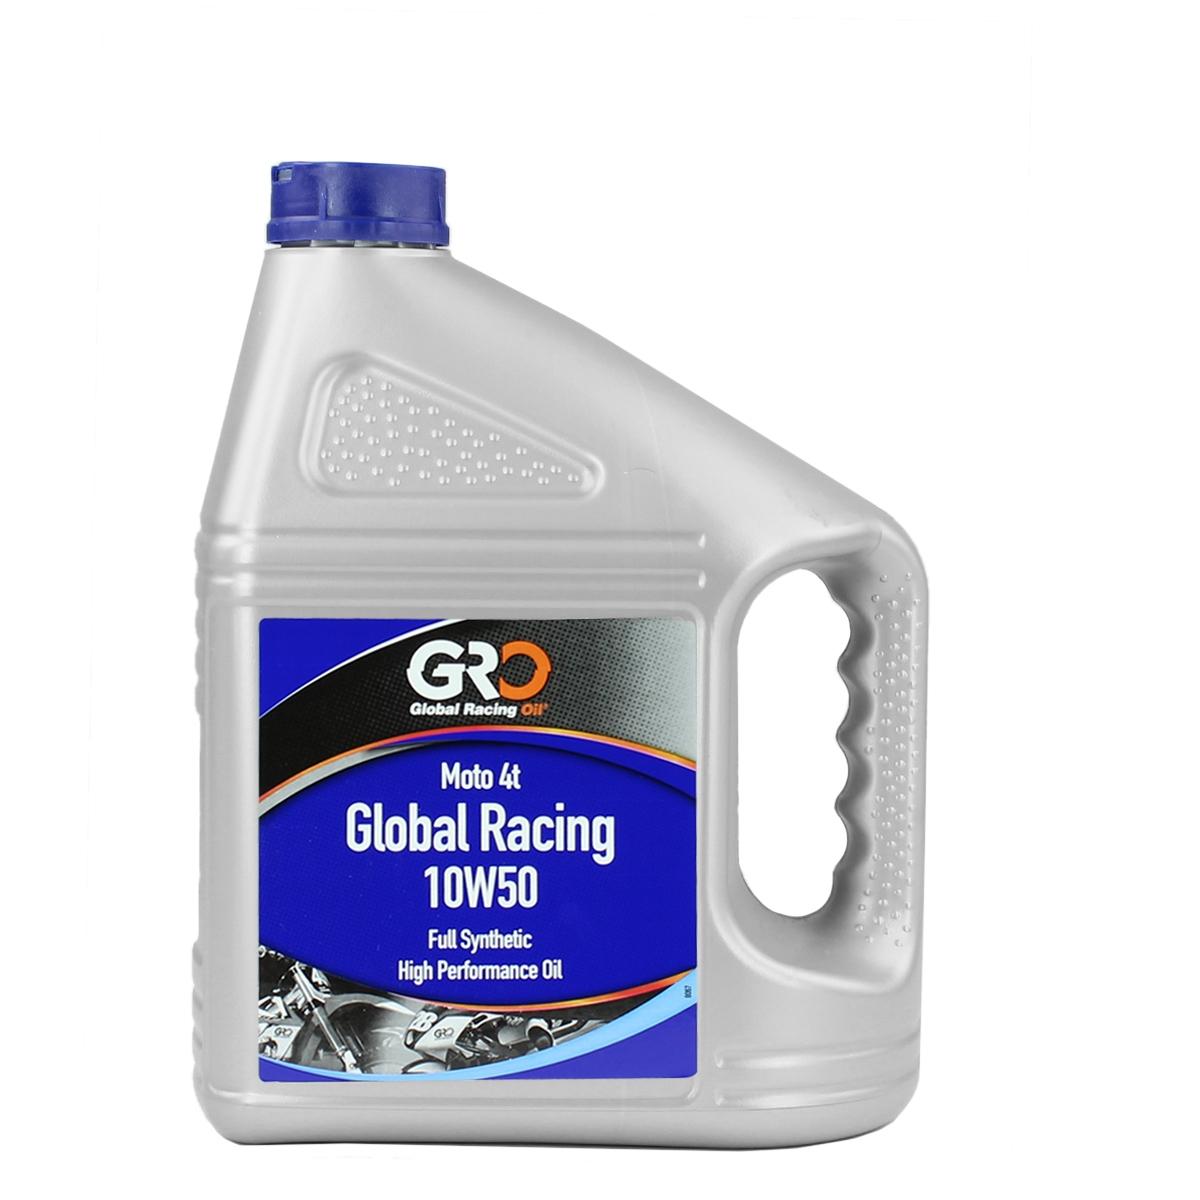 Huile GRO 4t racing 10w50 4L